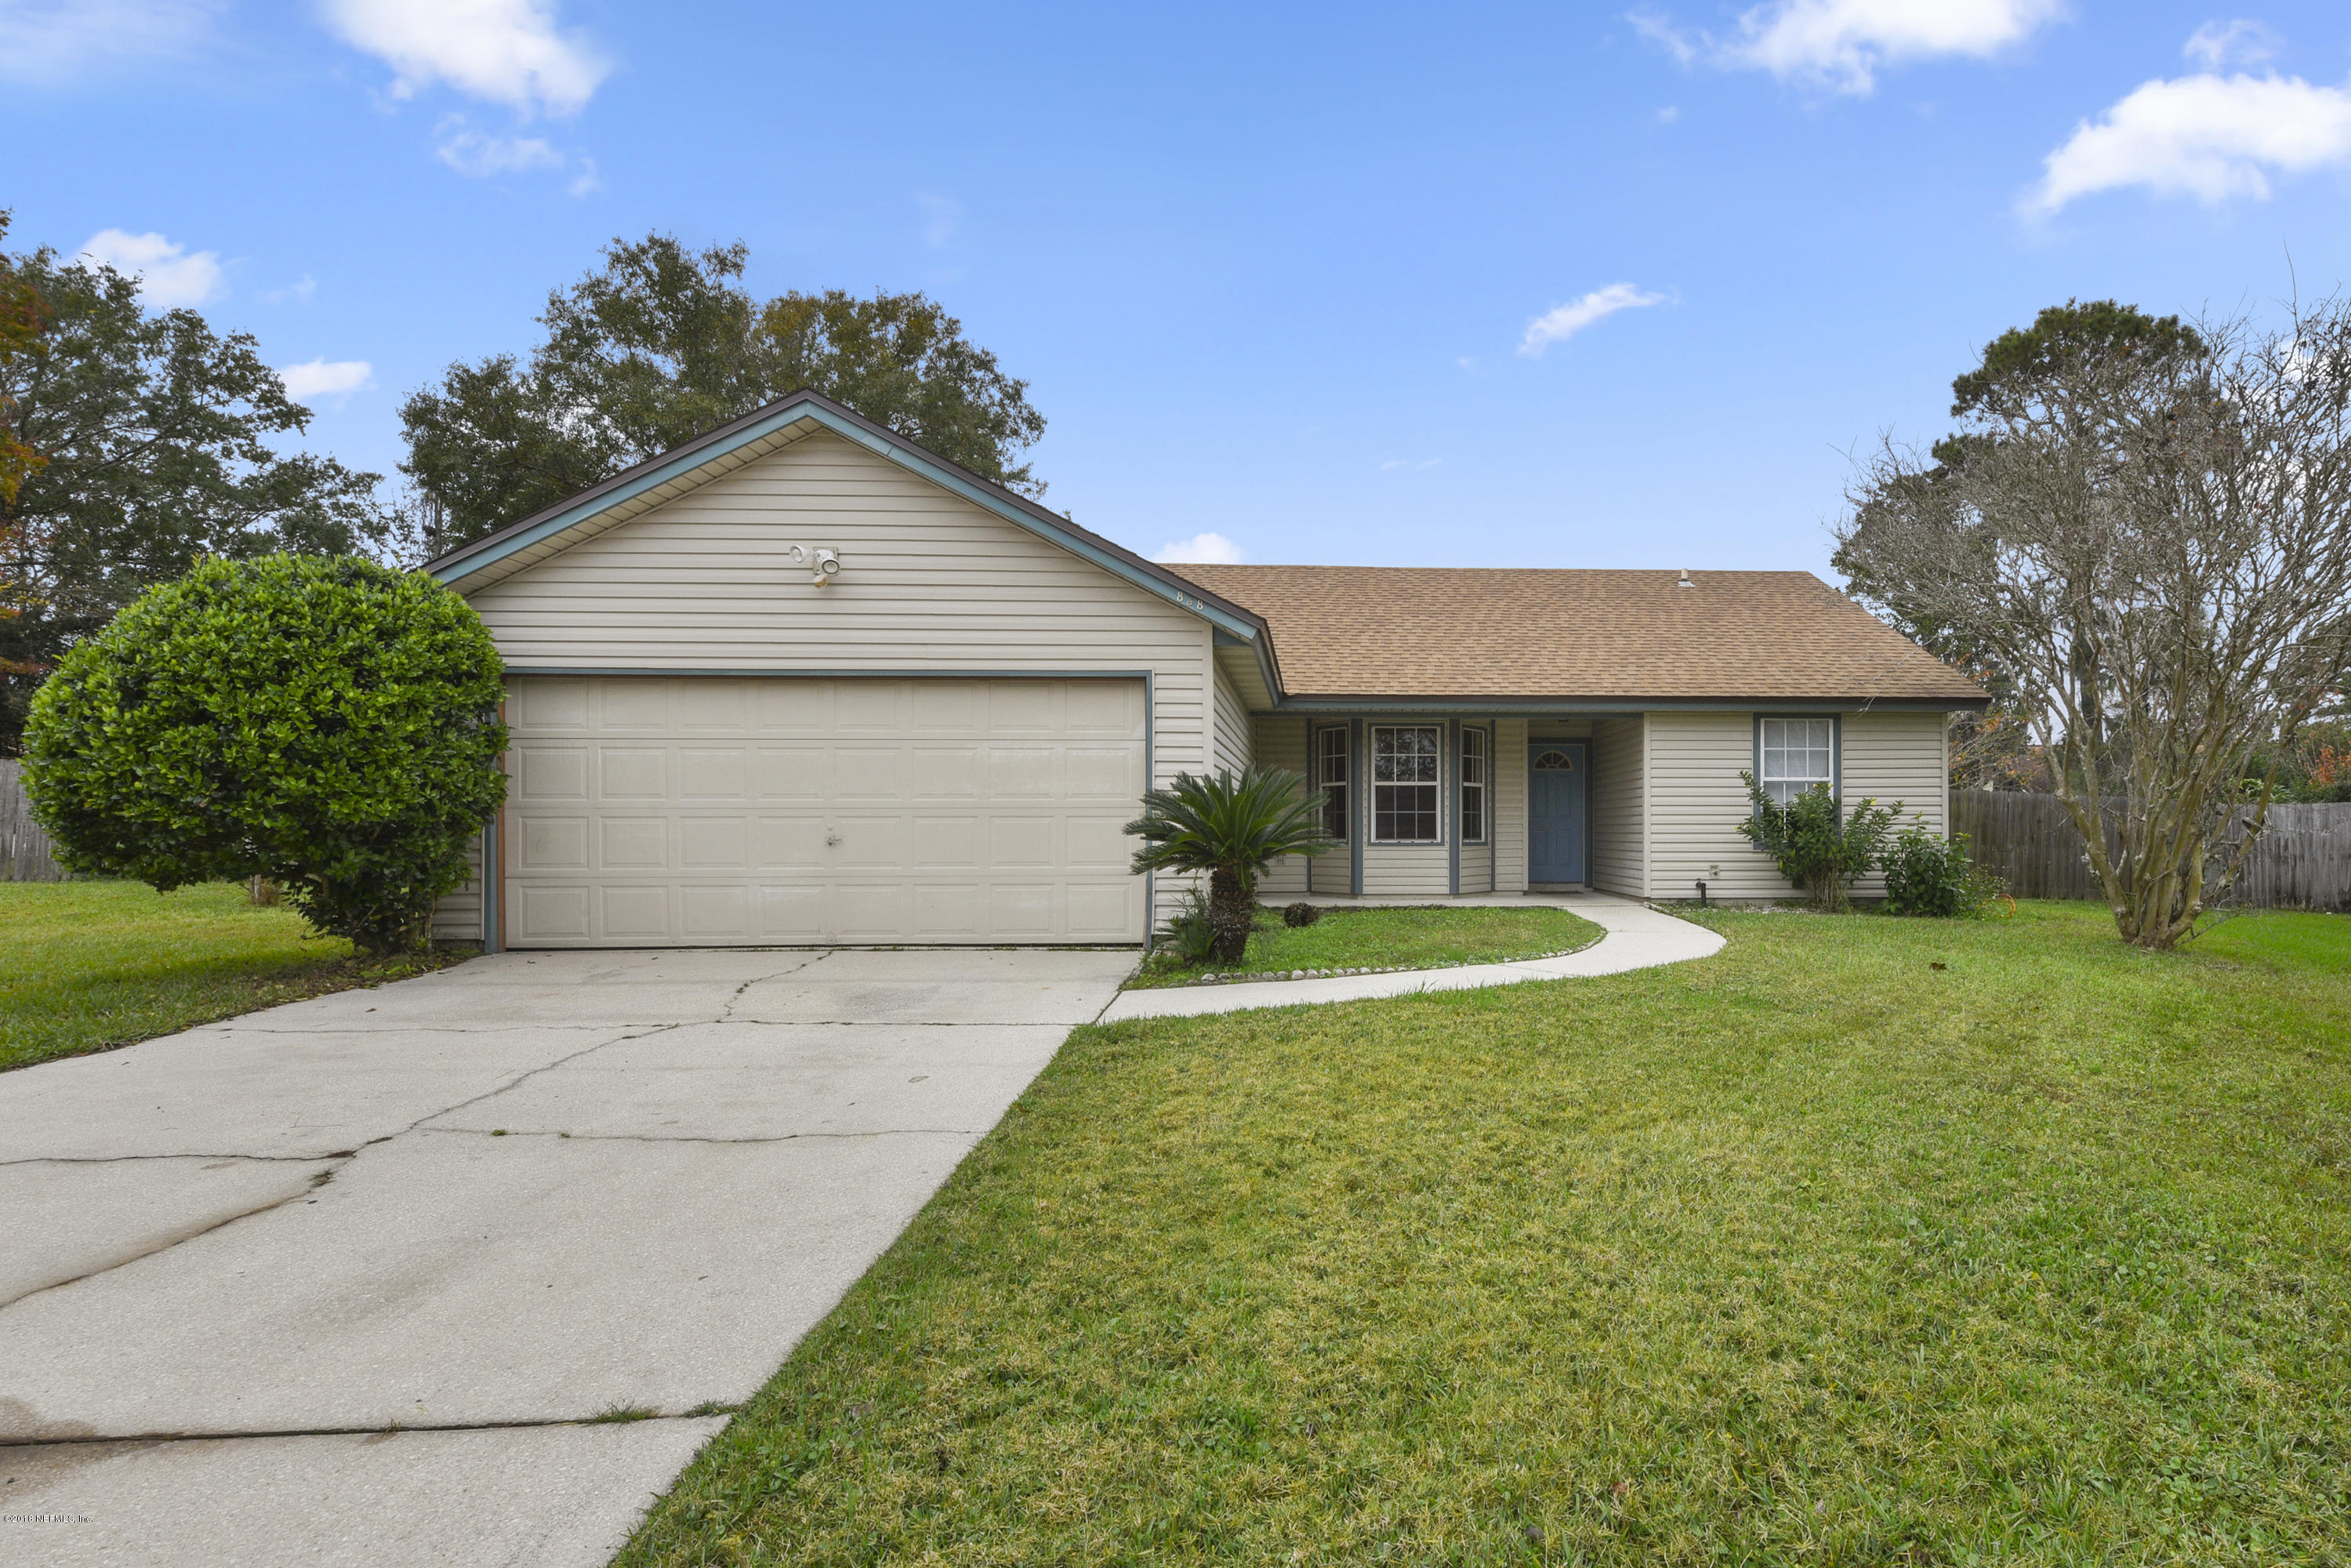 838 ROBERT MORRIS, ORANGE PARK, FLORIDA 32073, 3 Bedrooms Bedrooms, ,2 BathroomsBathrooms,Residential - single family,For sale,ROBERT MORRIS,970304